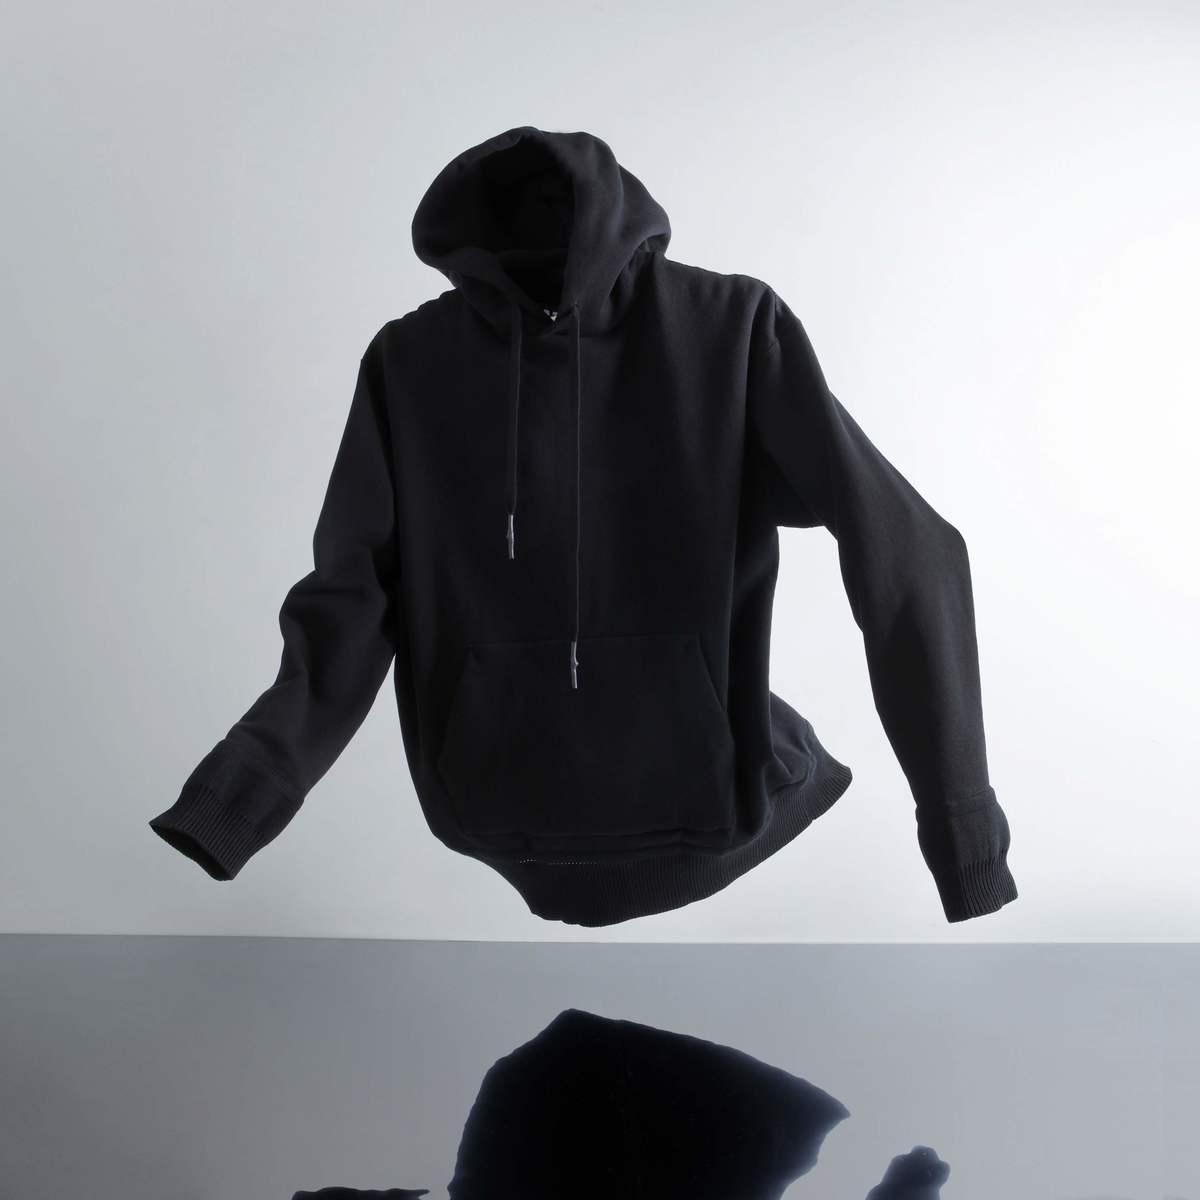 A-GIRLS ATMOS Pinnacle Pullover Hoodie(エイガールズ アトモス ピナクル プルオーバー フーディー)(BLACK)19SS-S